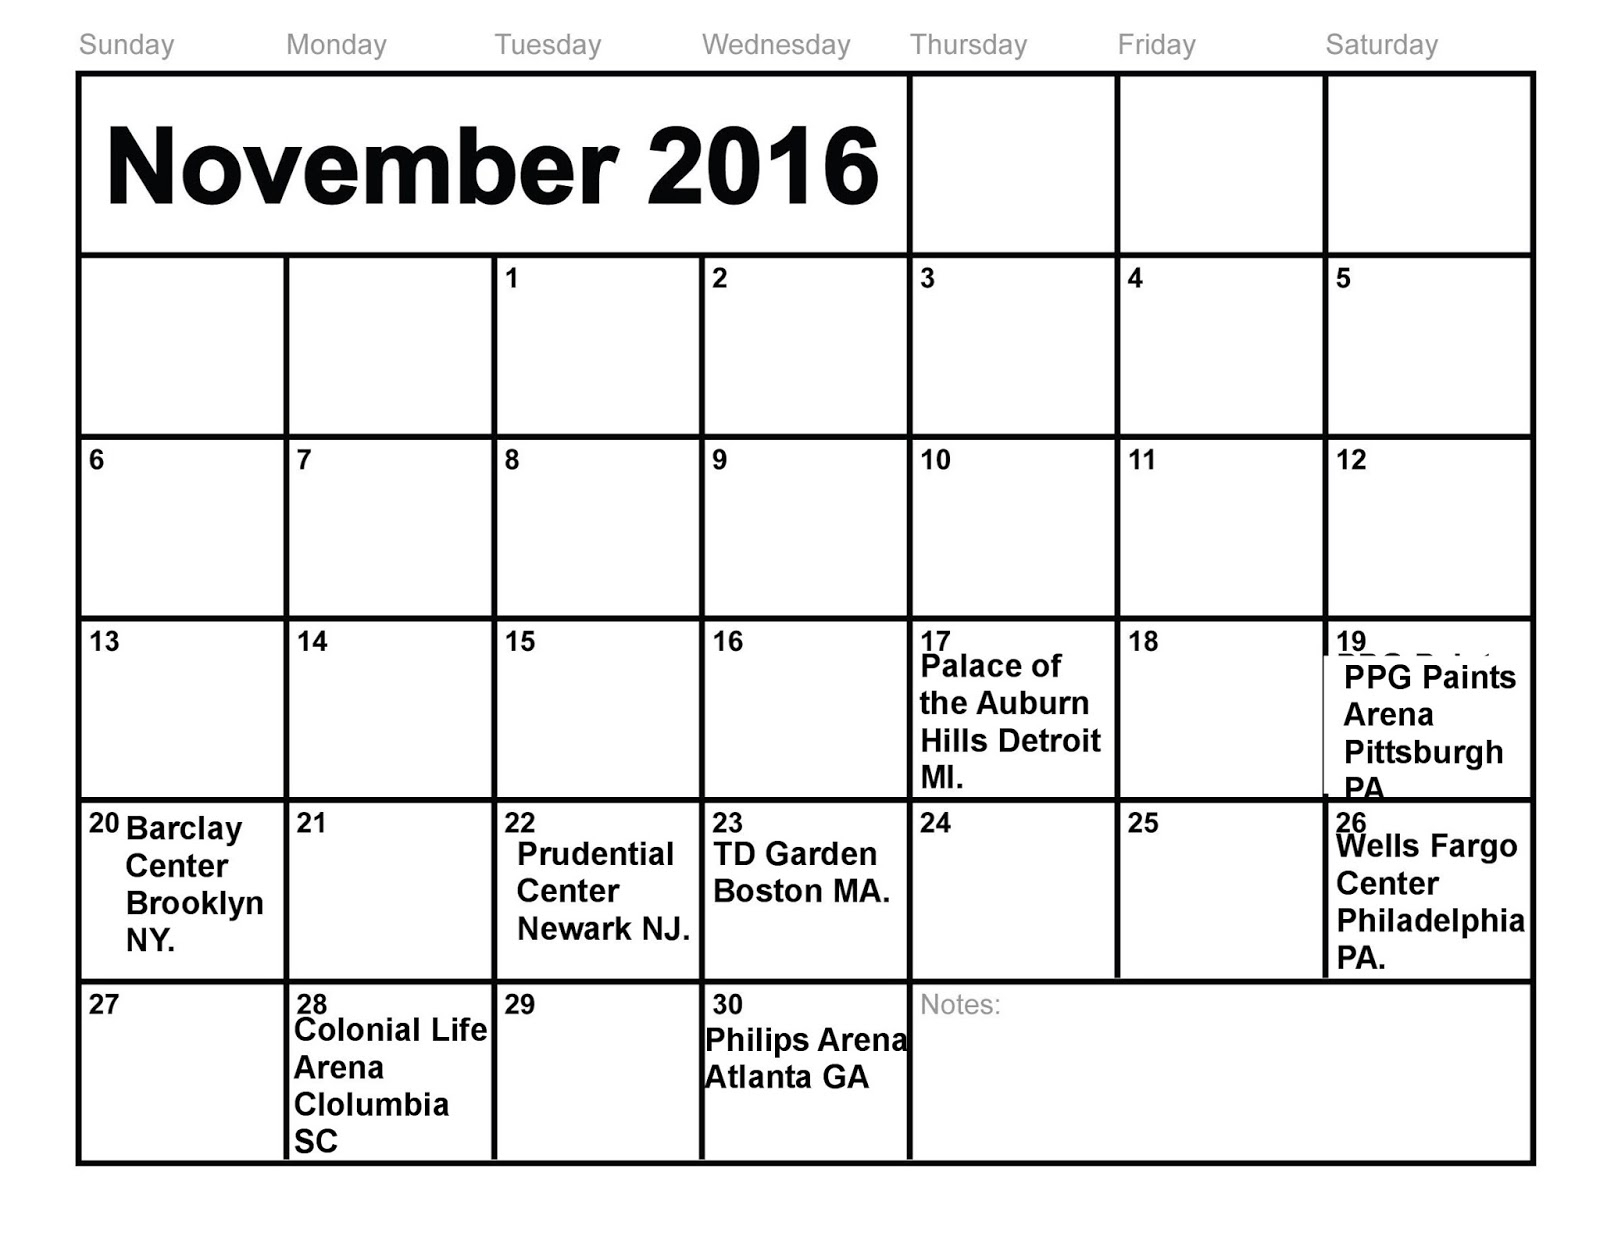 New York City Rhythm Facebook Post Sunday November 13th